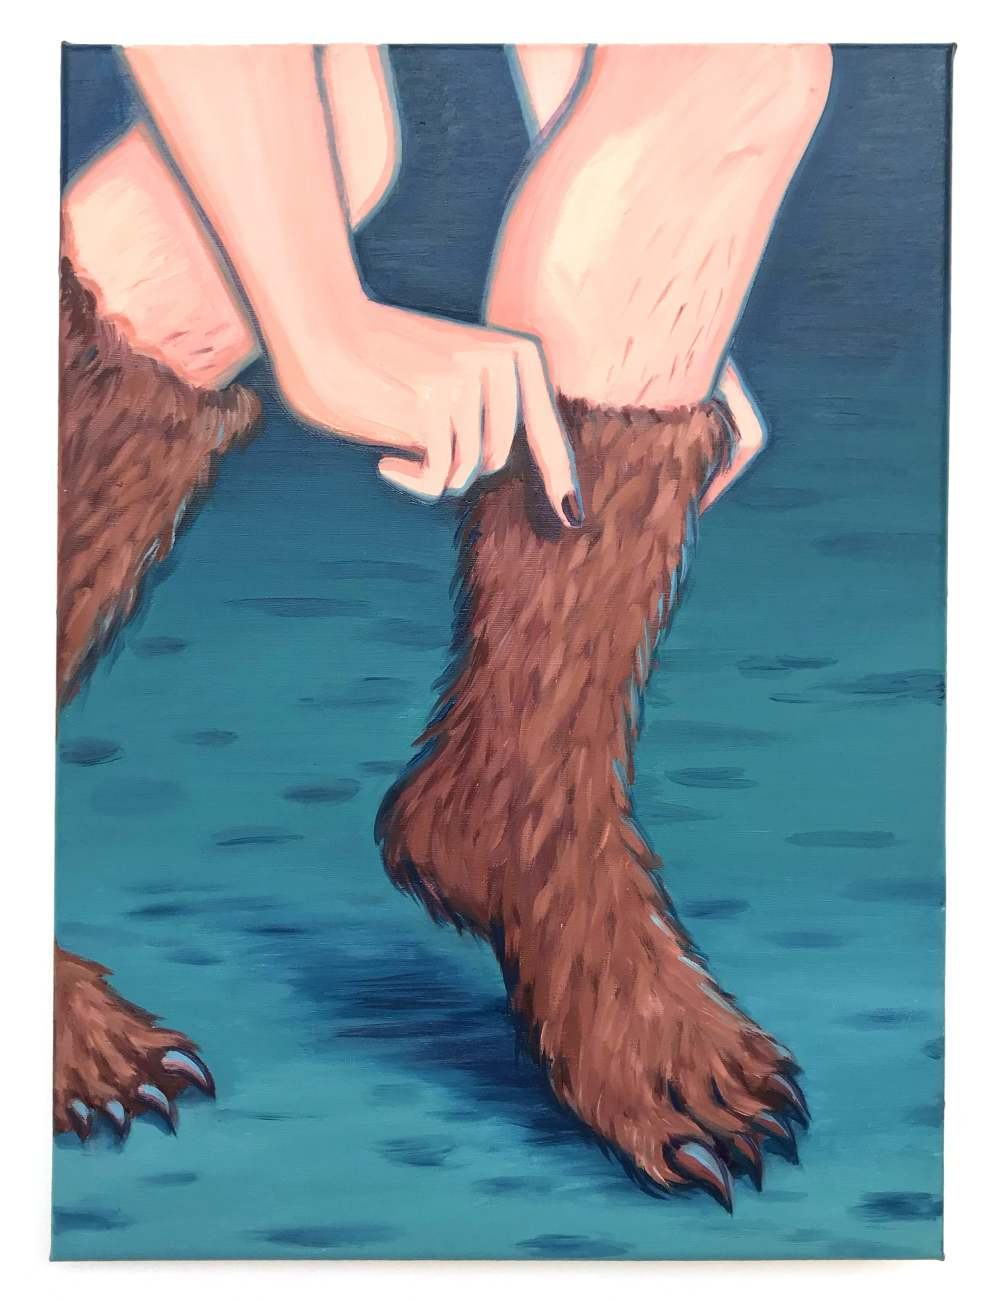 Get dressed, oil on canvas, 40x30cm, 2020 Lise Stoufflet   Alba Herrero   Mujeres Mirando Mujeres